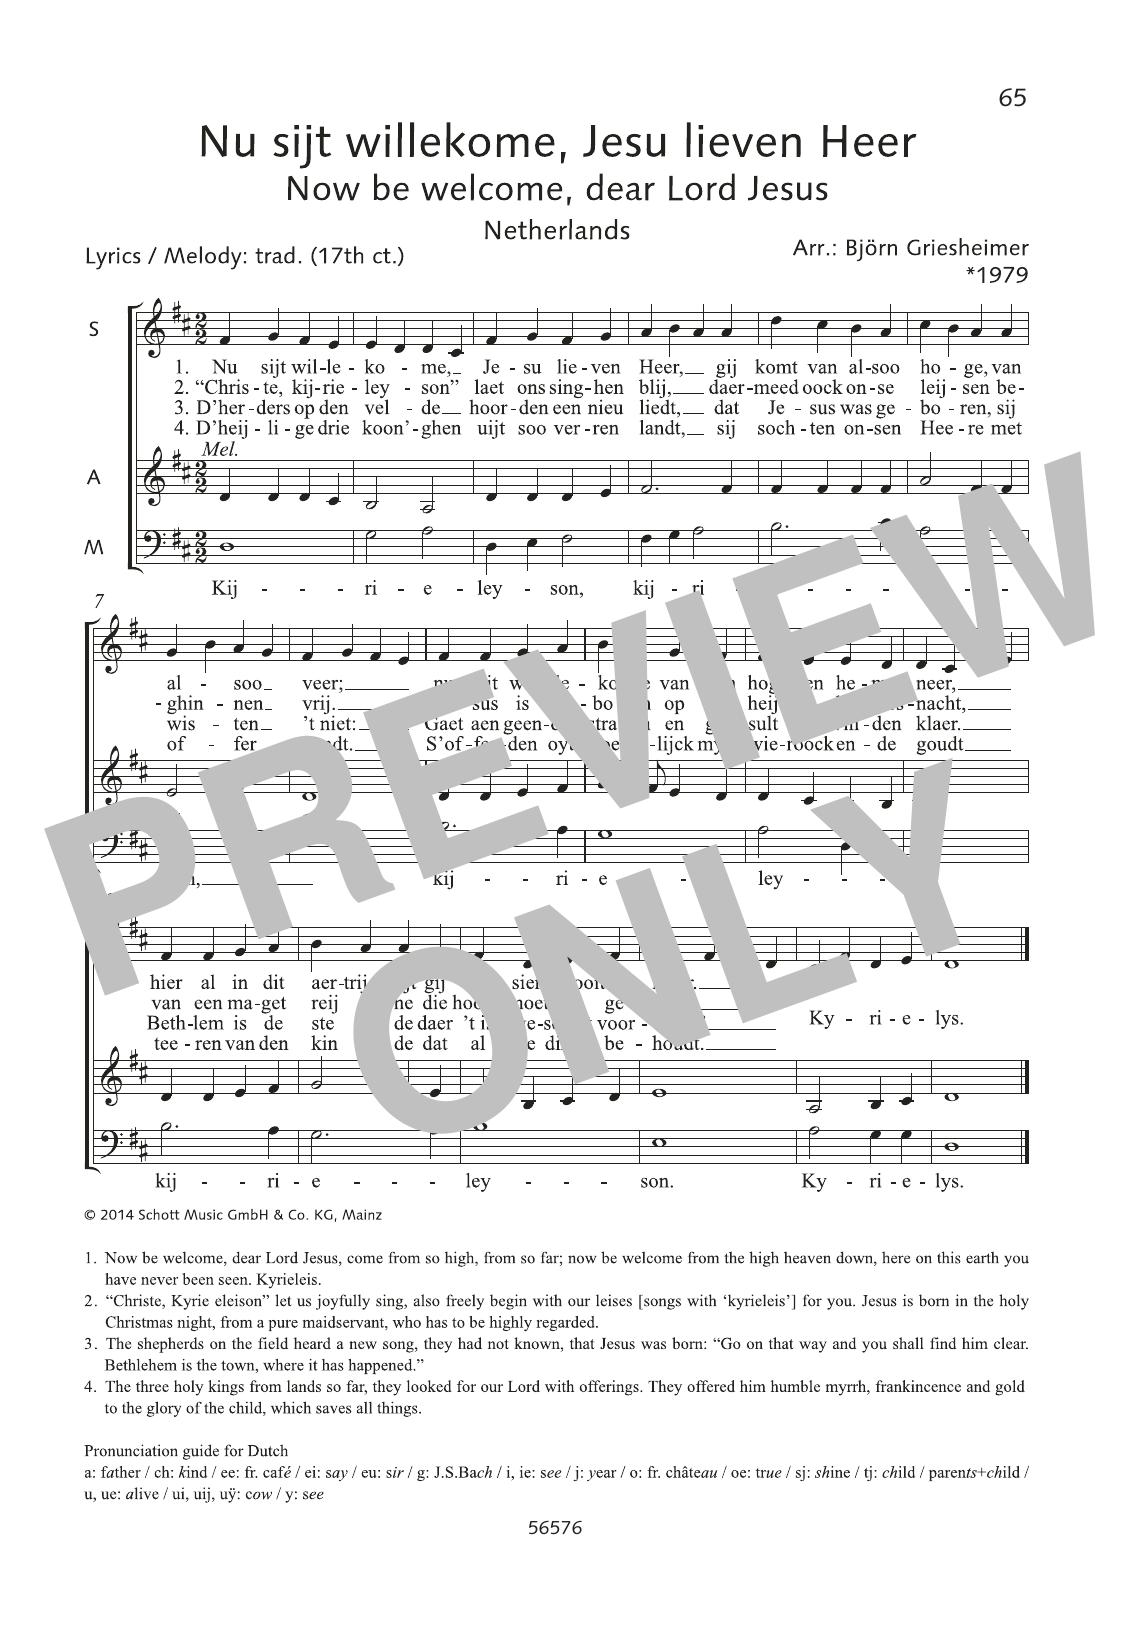 Nu sijt willekome, Jesu lieven Heer Sheet Music